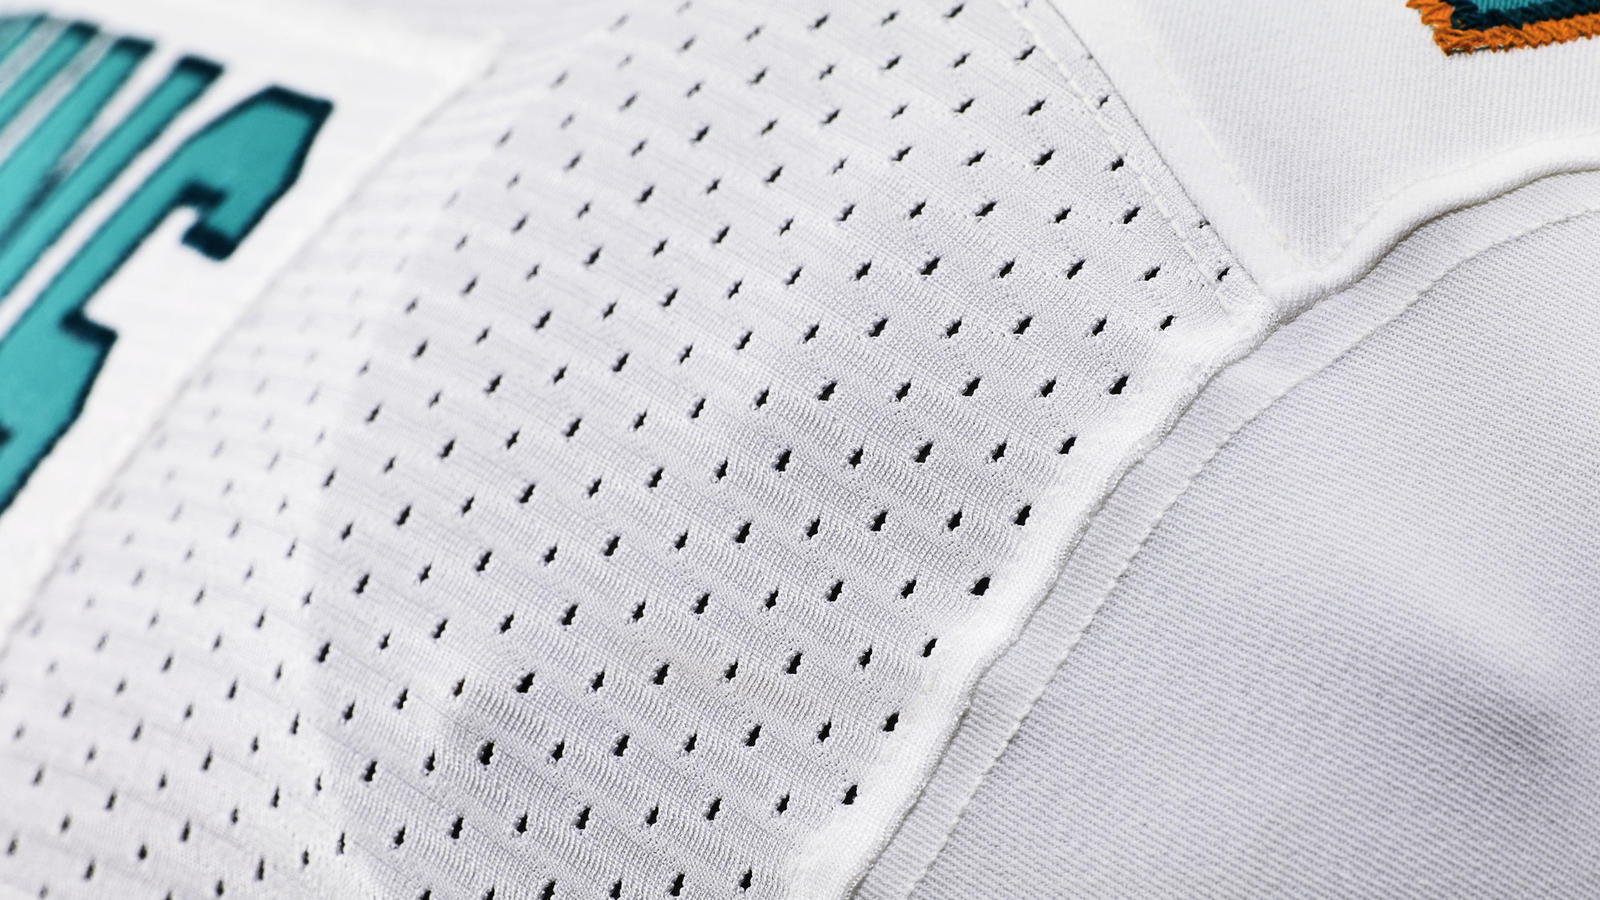 miami-nike-elite-51-uniform-zoned-mesh-ventilation